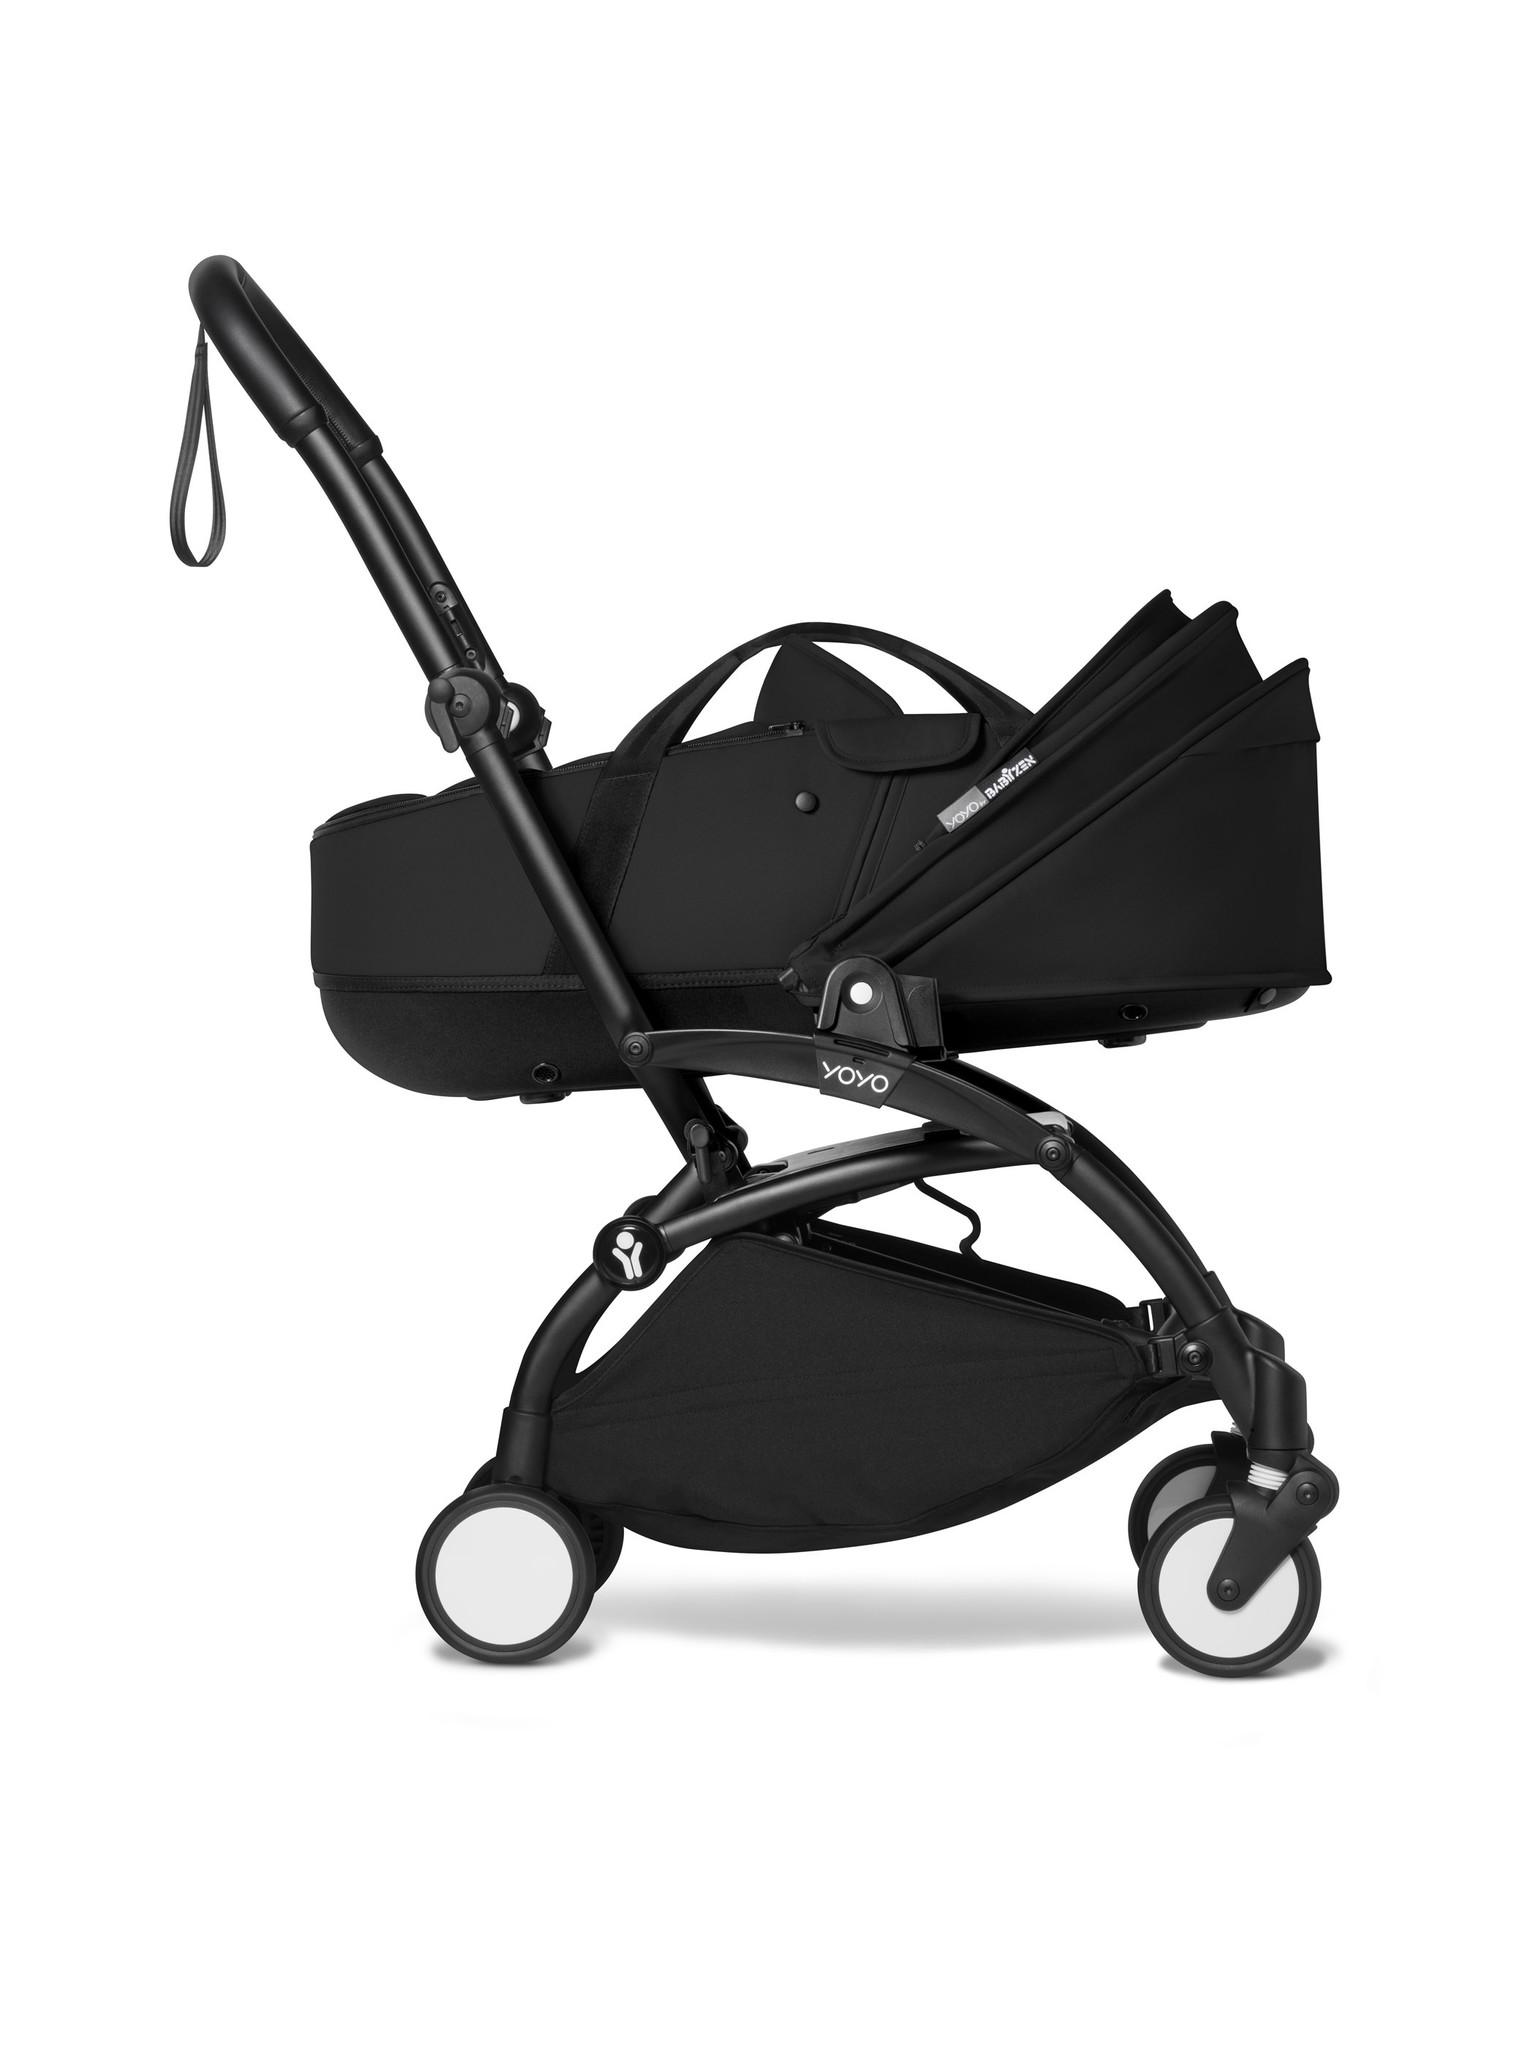 Babyzen Babyzen YOYO² zwart frame met YOYO Bassinet - reiswieg 0+ én Colorpack 6+ beiden in zwart